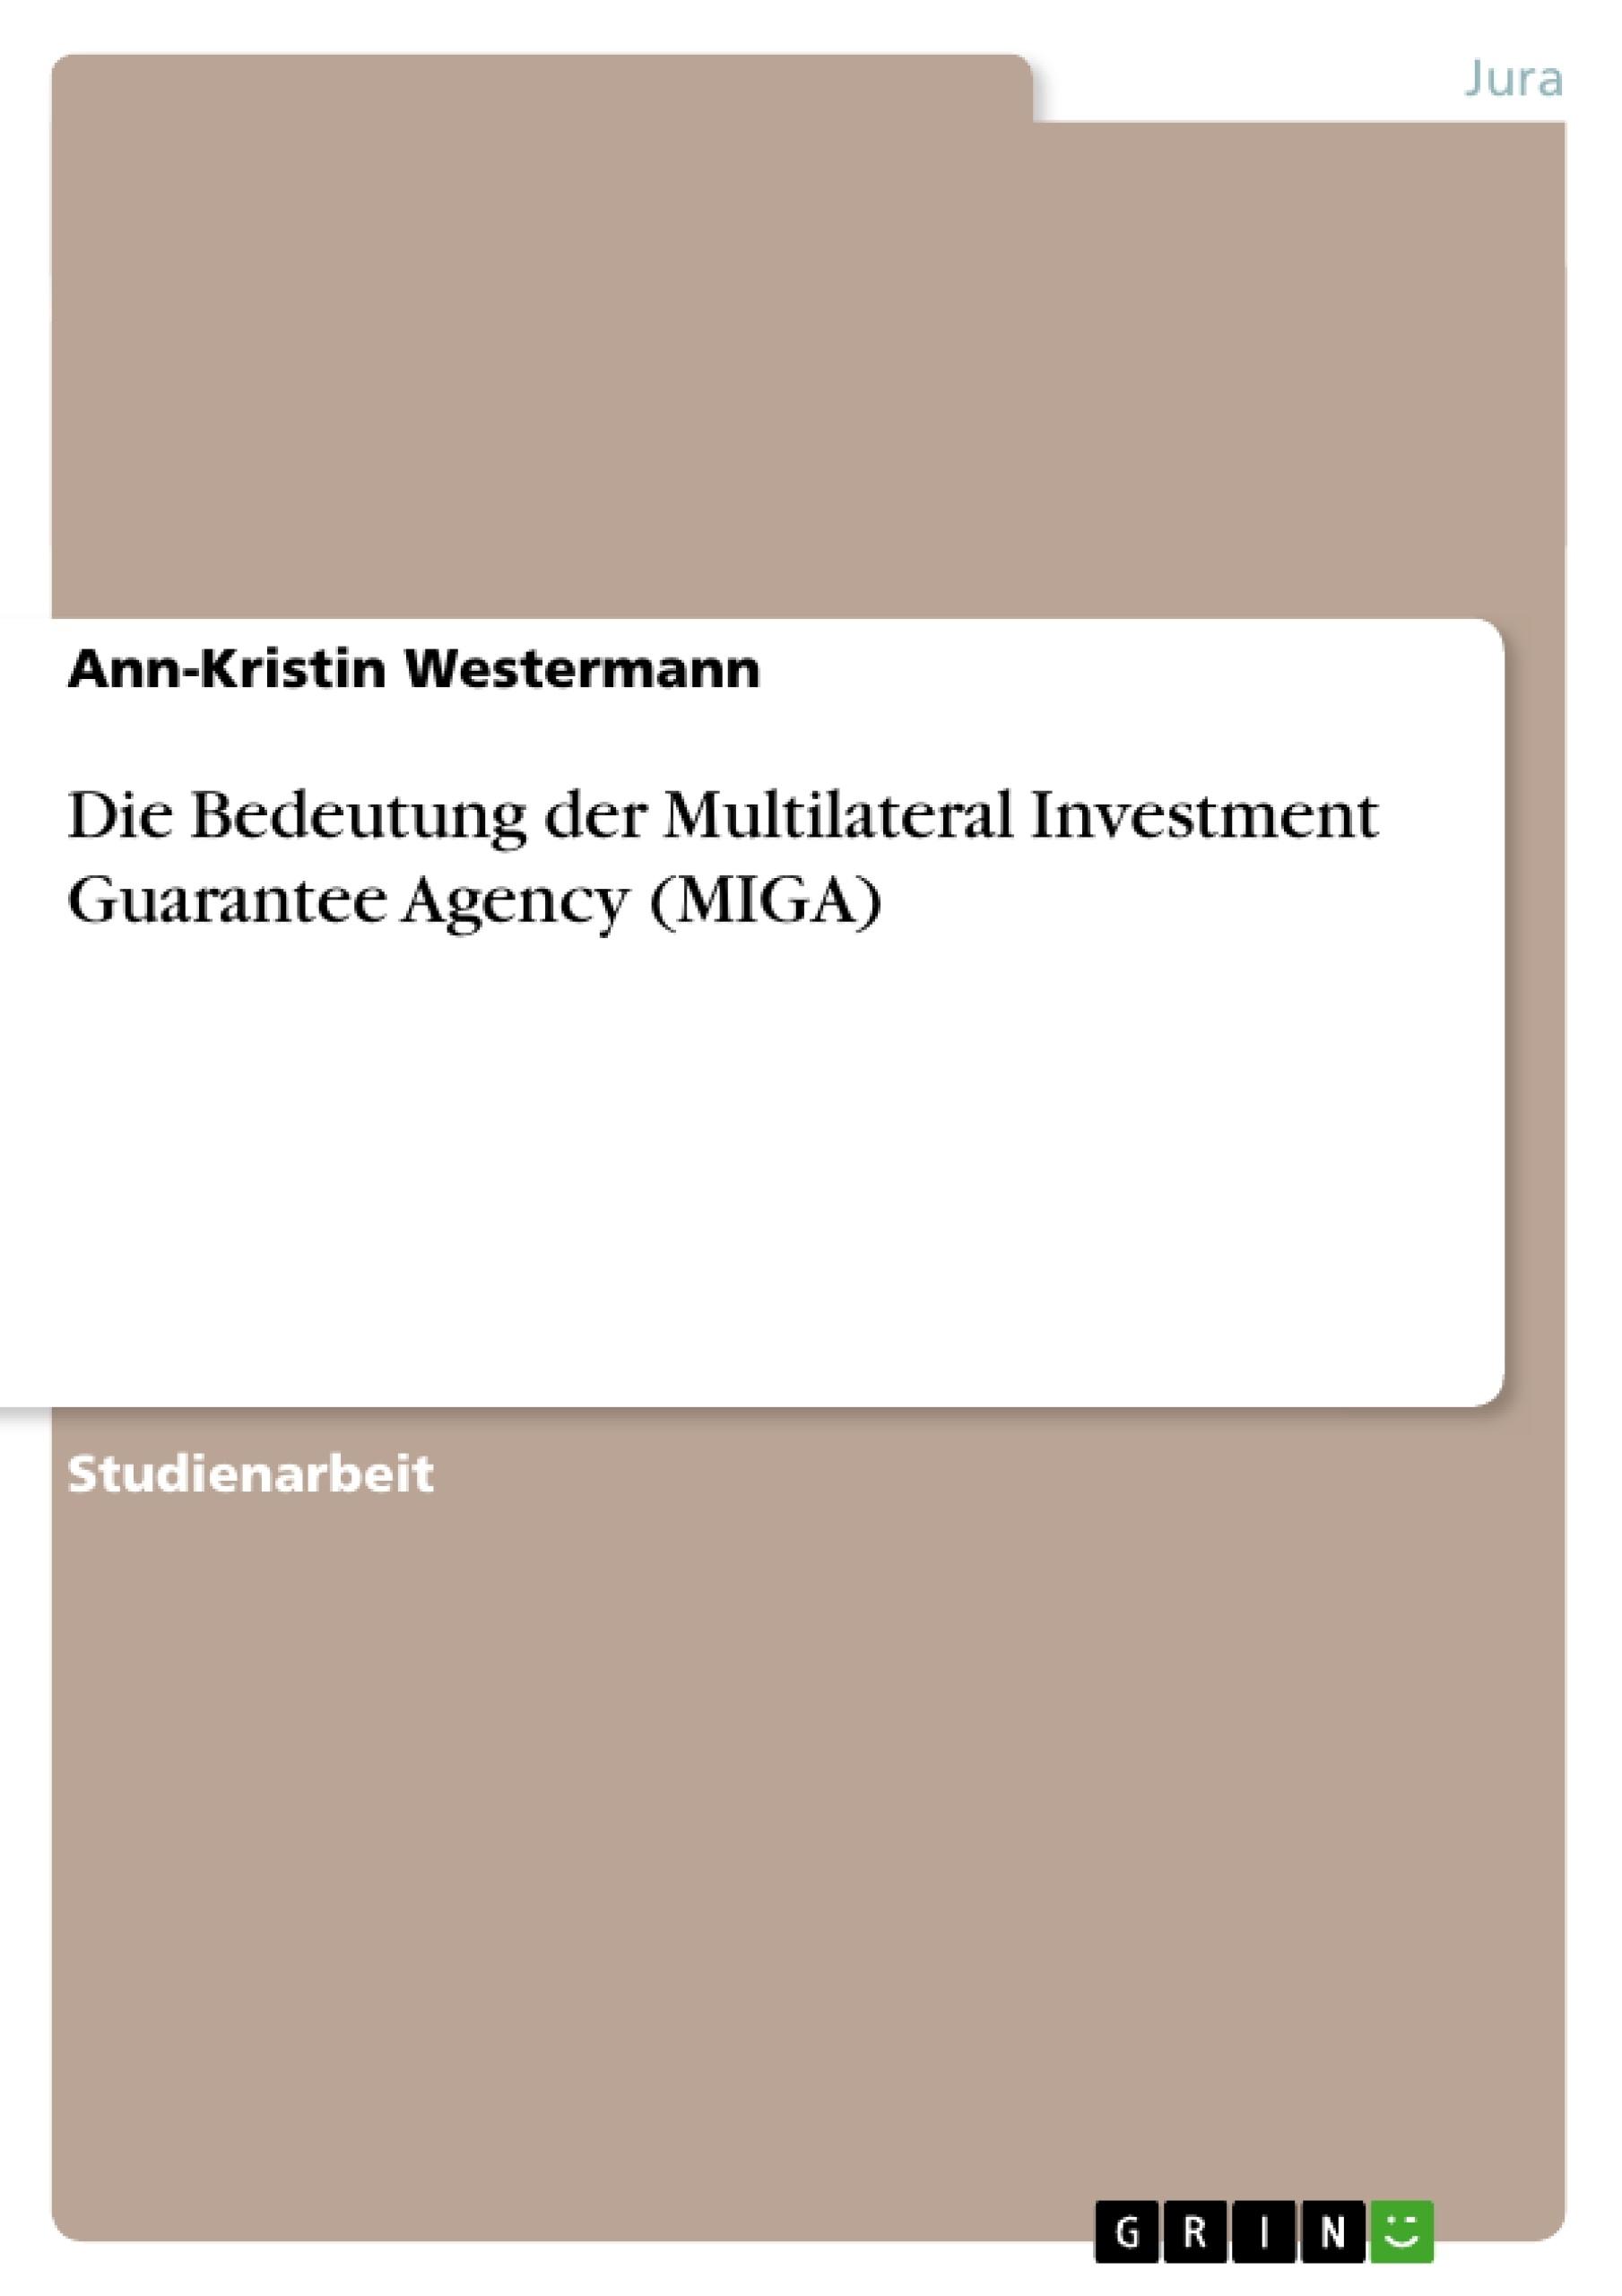 Titel: Die Bedeutung der Multilateral Investment Guarantee Agency (MIGA)